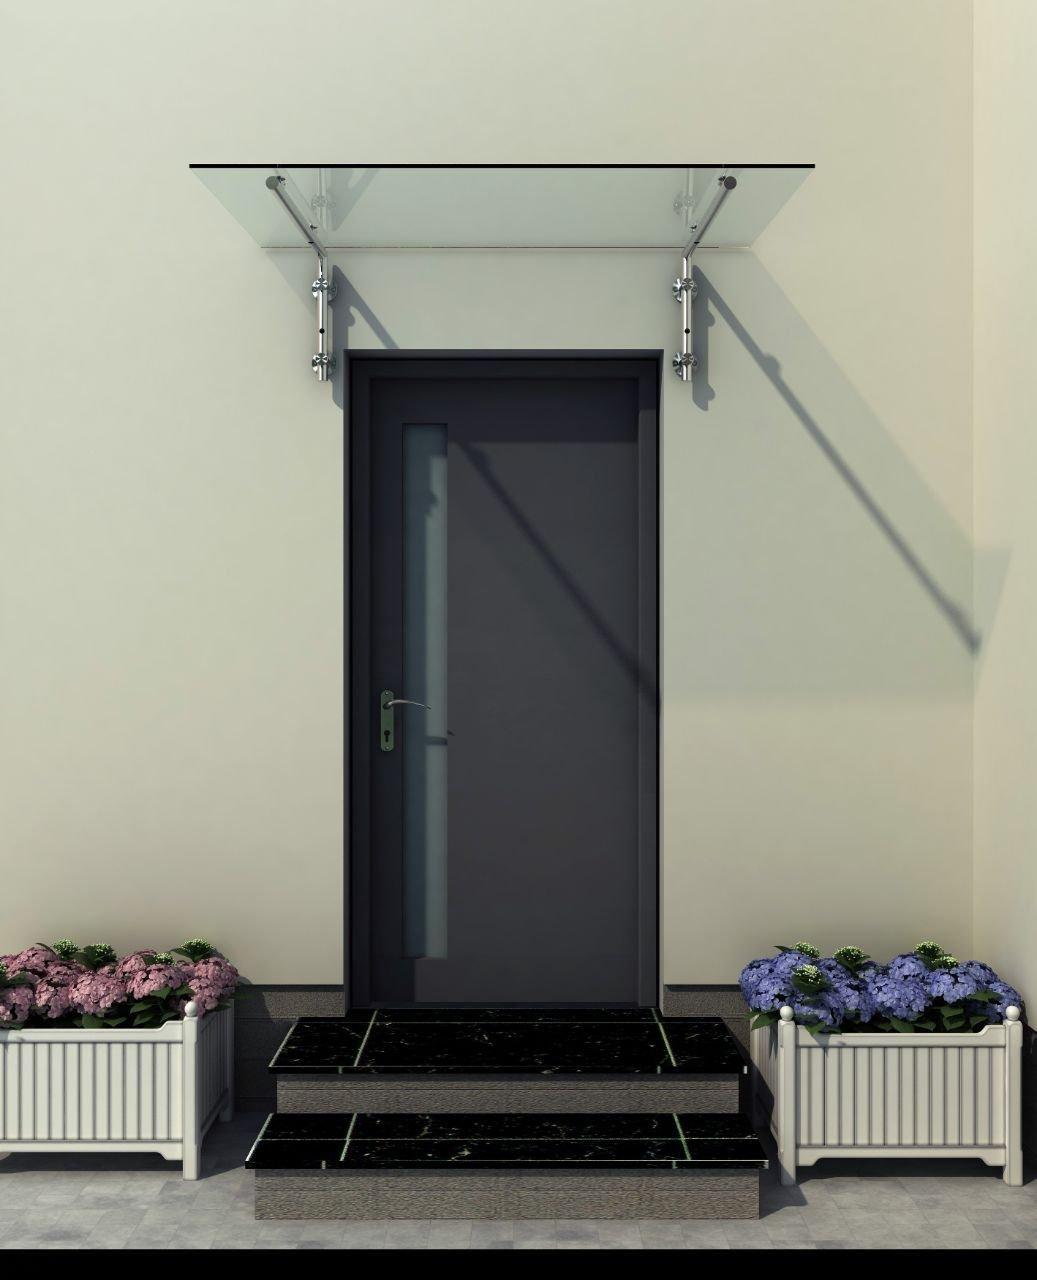 180 x 90 cm Glasvordach Vordach T/ürvordach T/ürdach Haust/ür Klarglas Glas Edelstahl VSG